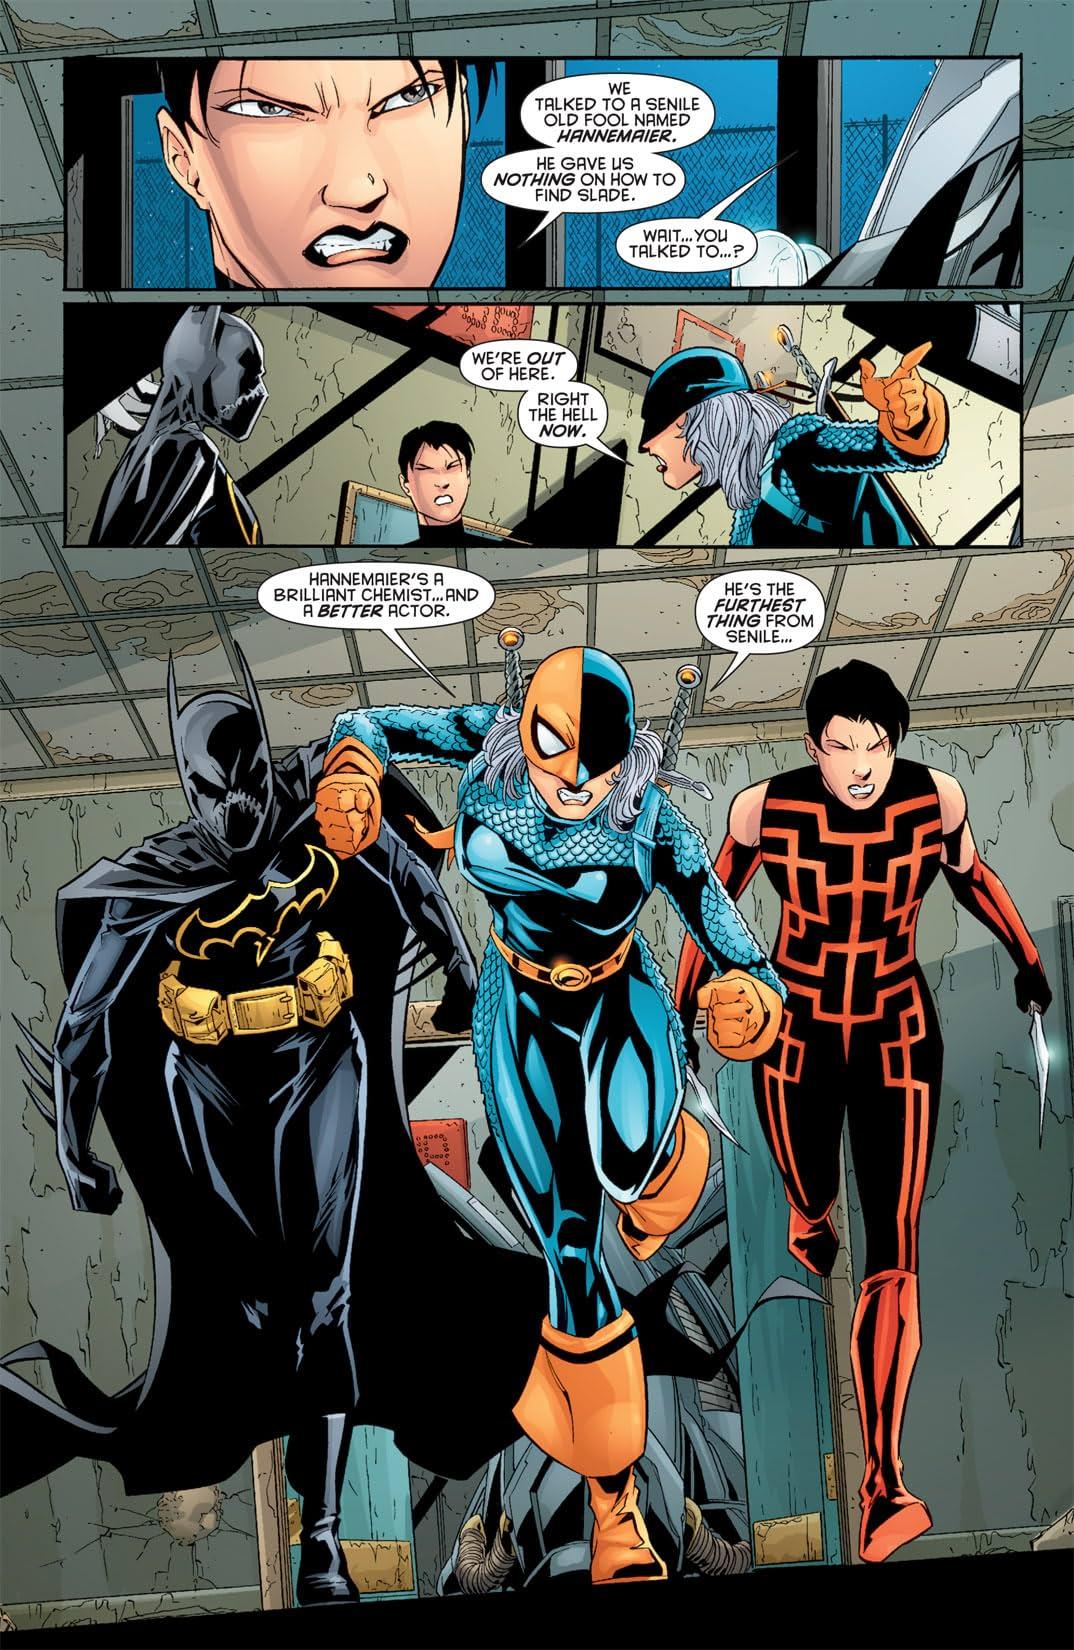 Batgirl (2008) #3 (of 6)